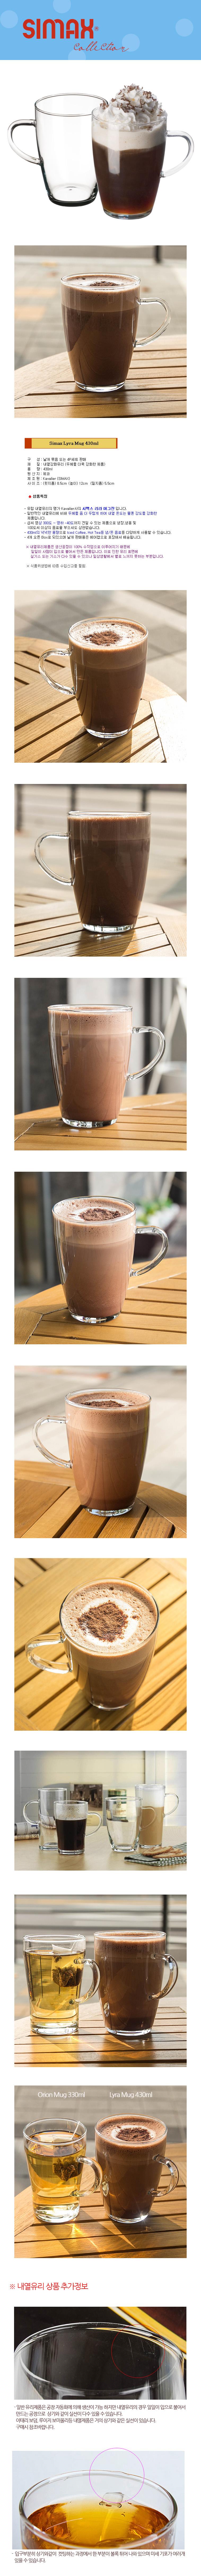 Simax 내열강화 리라(Lyra) Mug 2P - 더리빙샵, 12,750원, 머그컵, 머그컵 세트